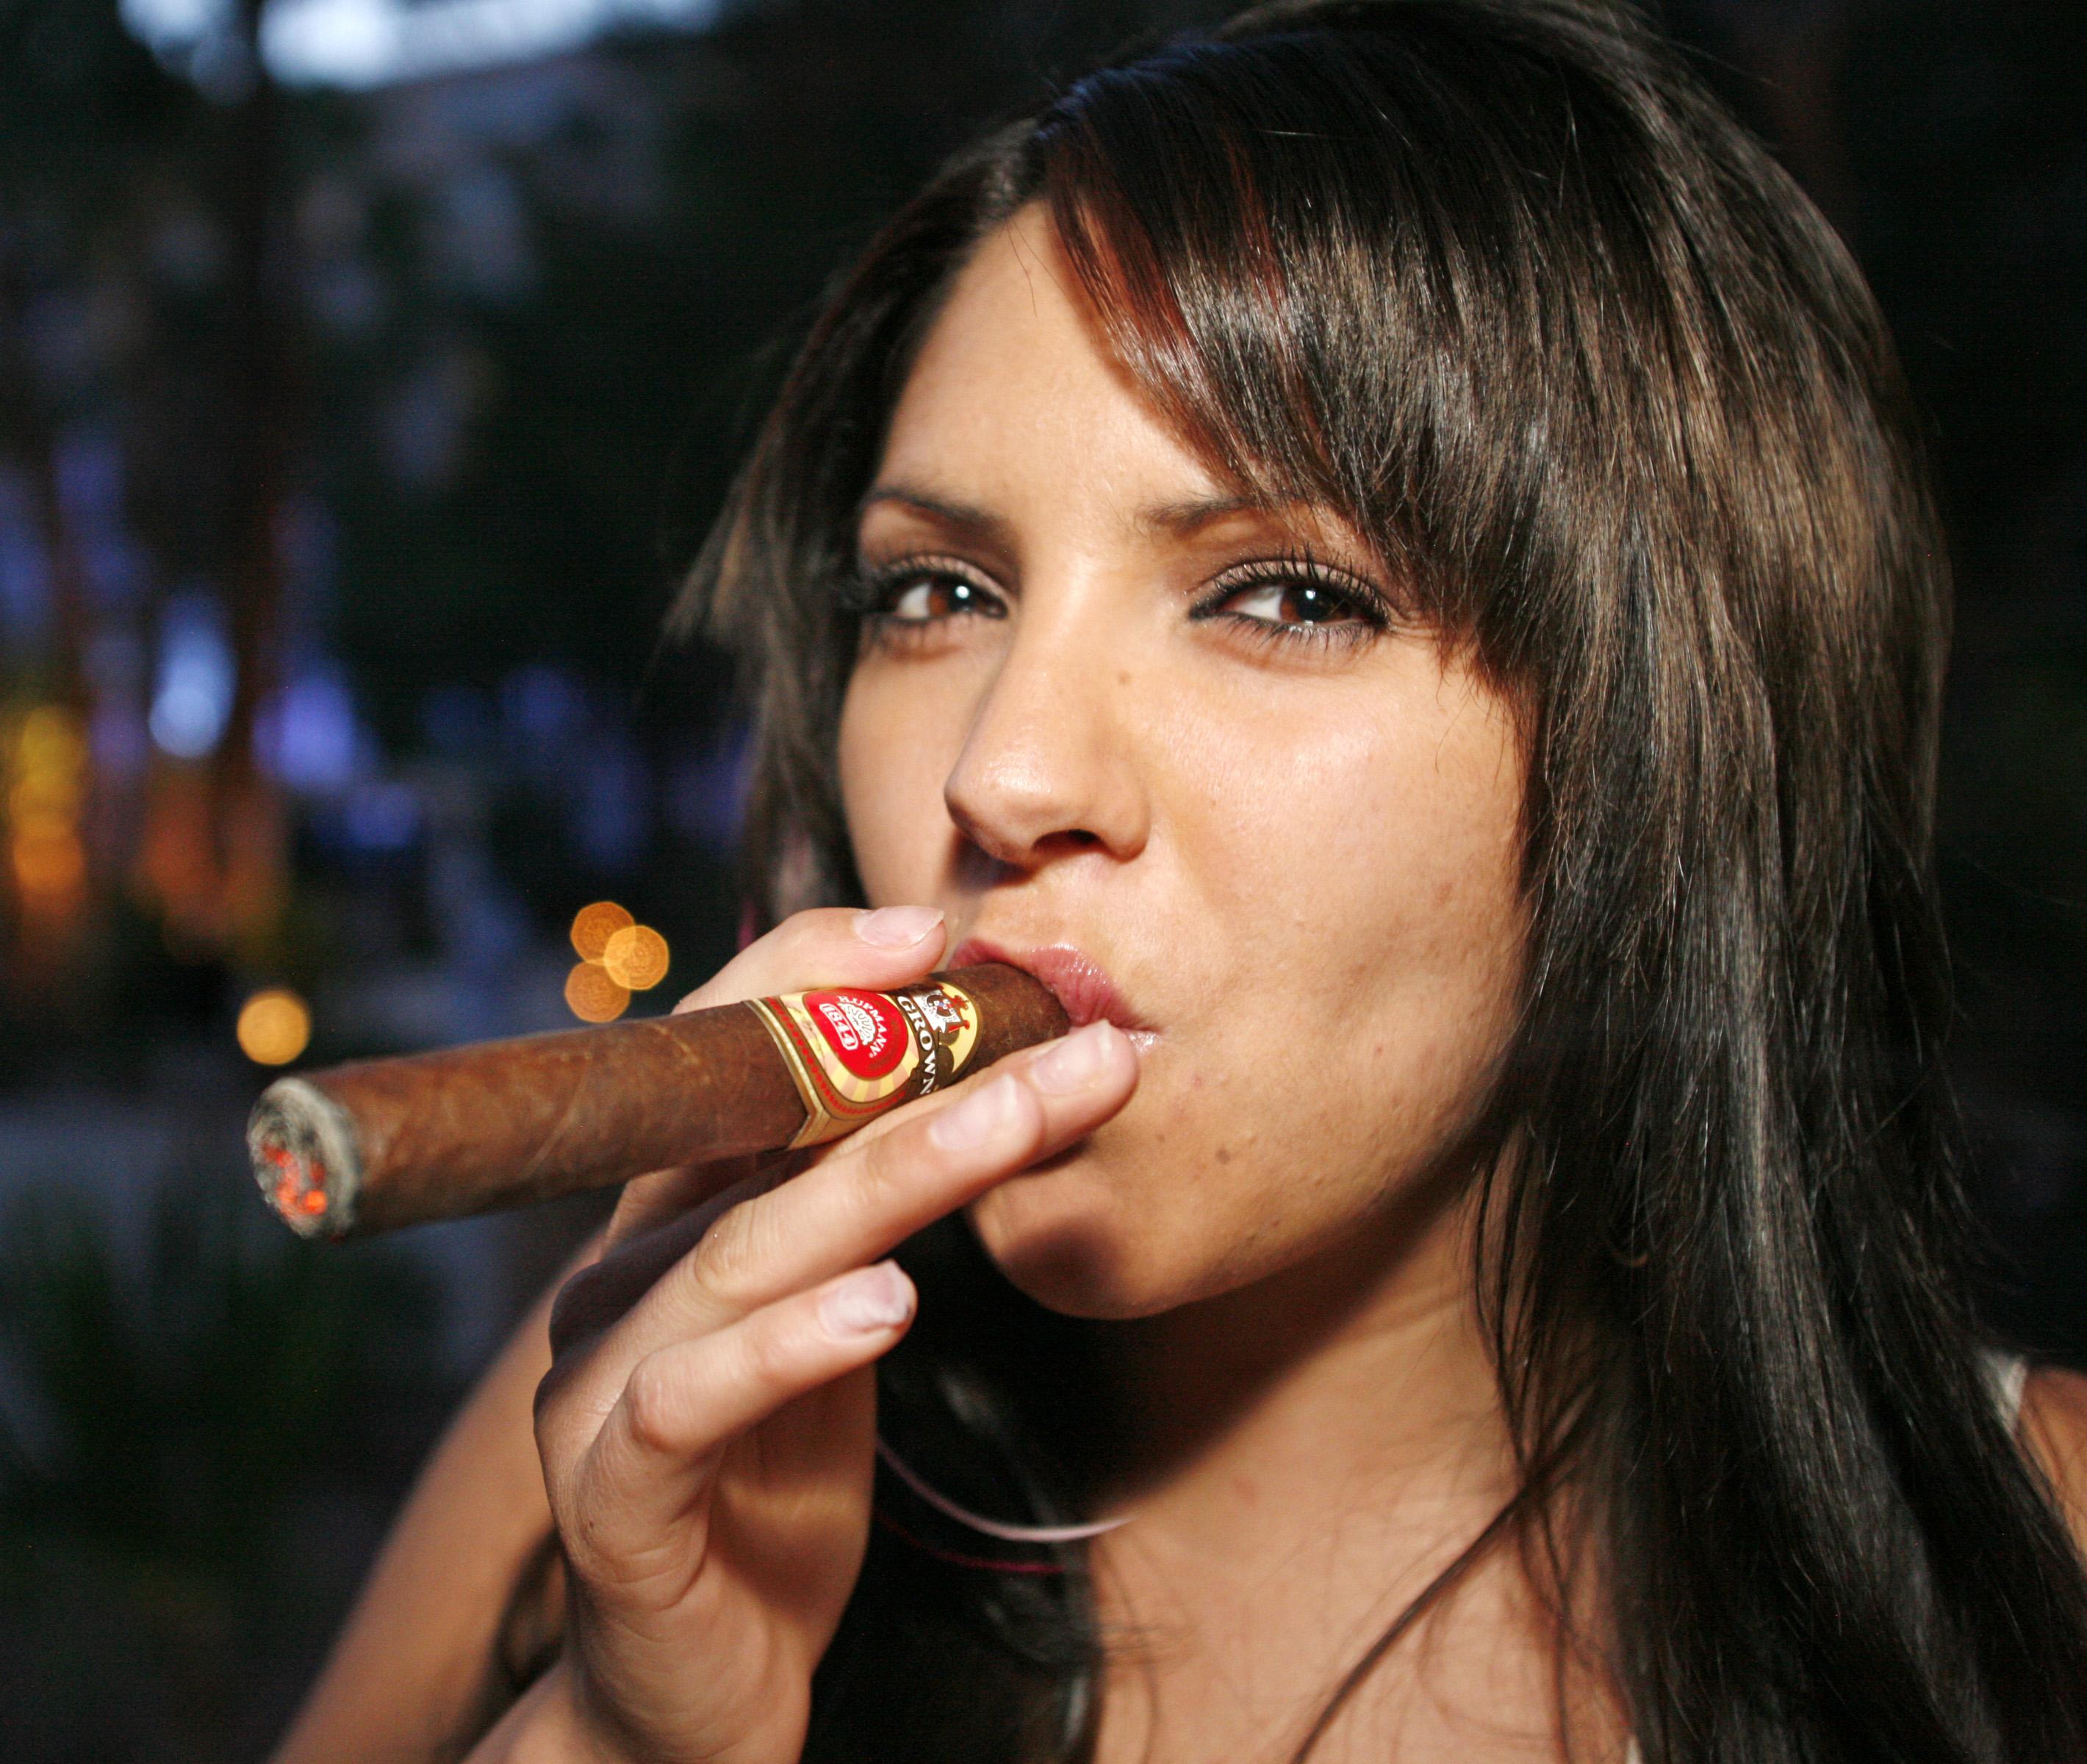 Что мужчина думает о женском курении?  | мужчина и женщина | школажизни.ру